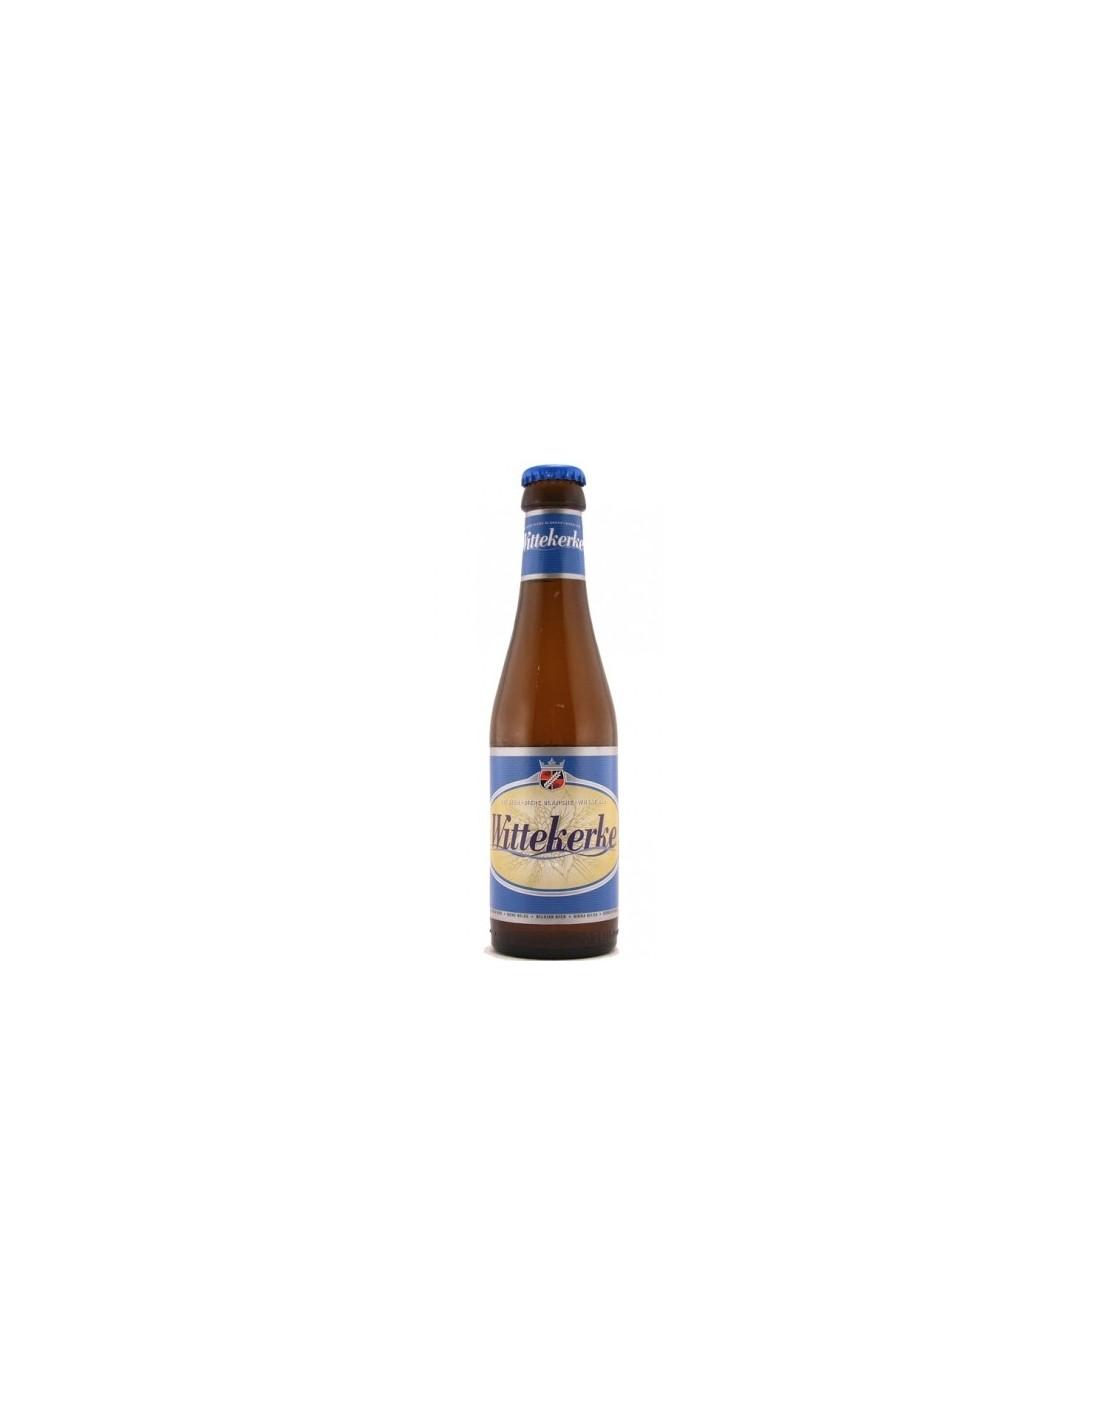 Bere blonda Wittekerke, 5% alc., 0.25L, Belgia